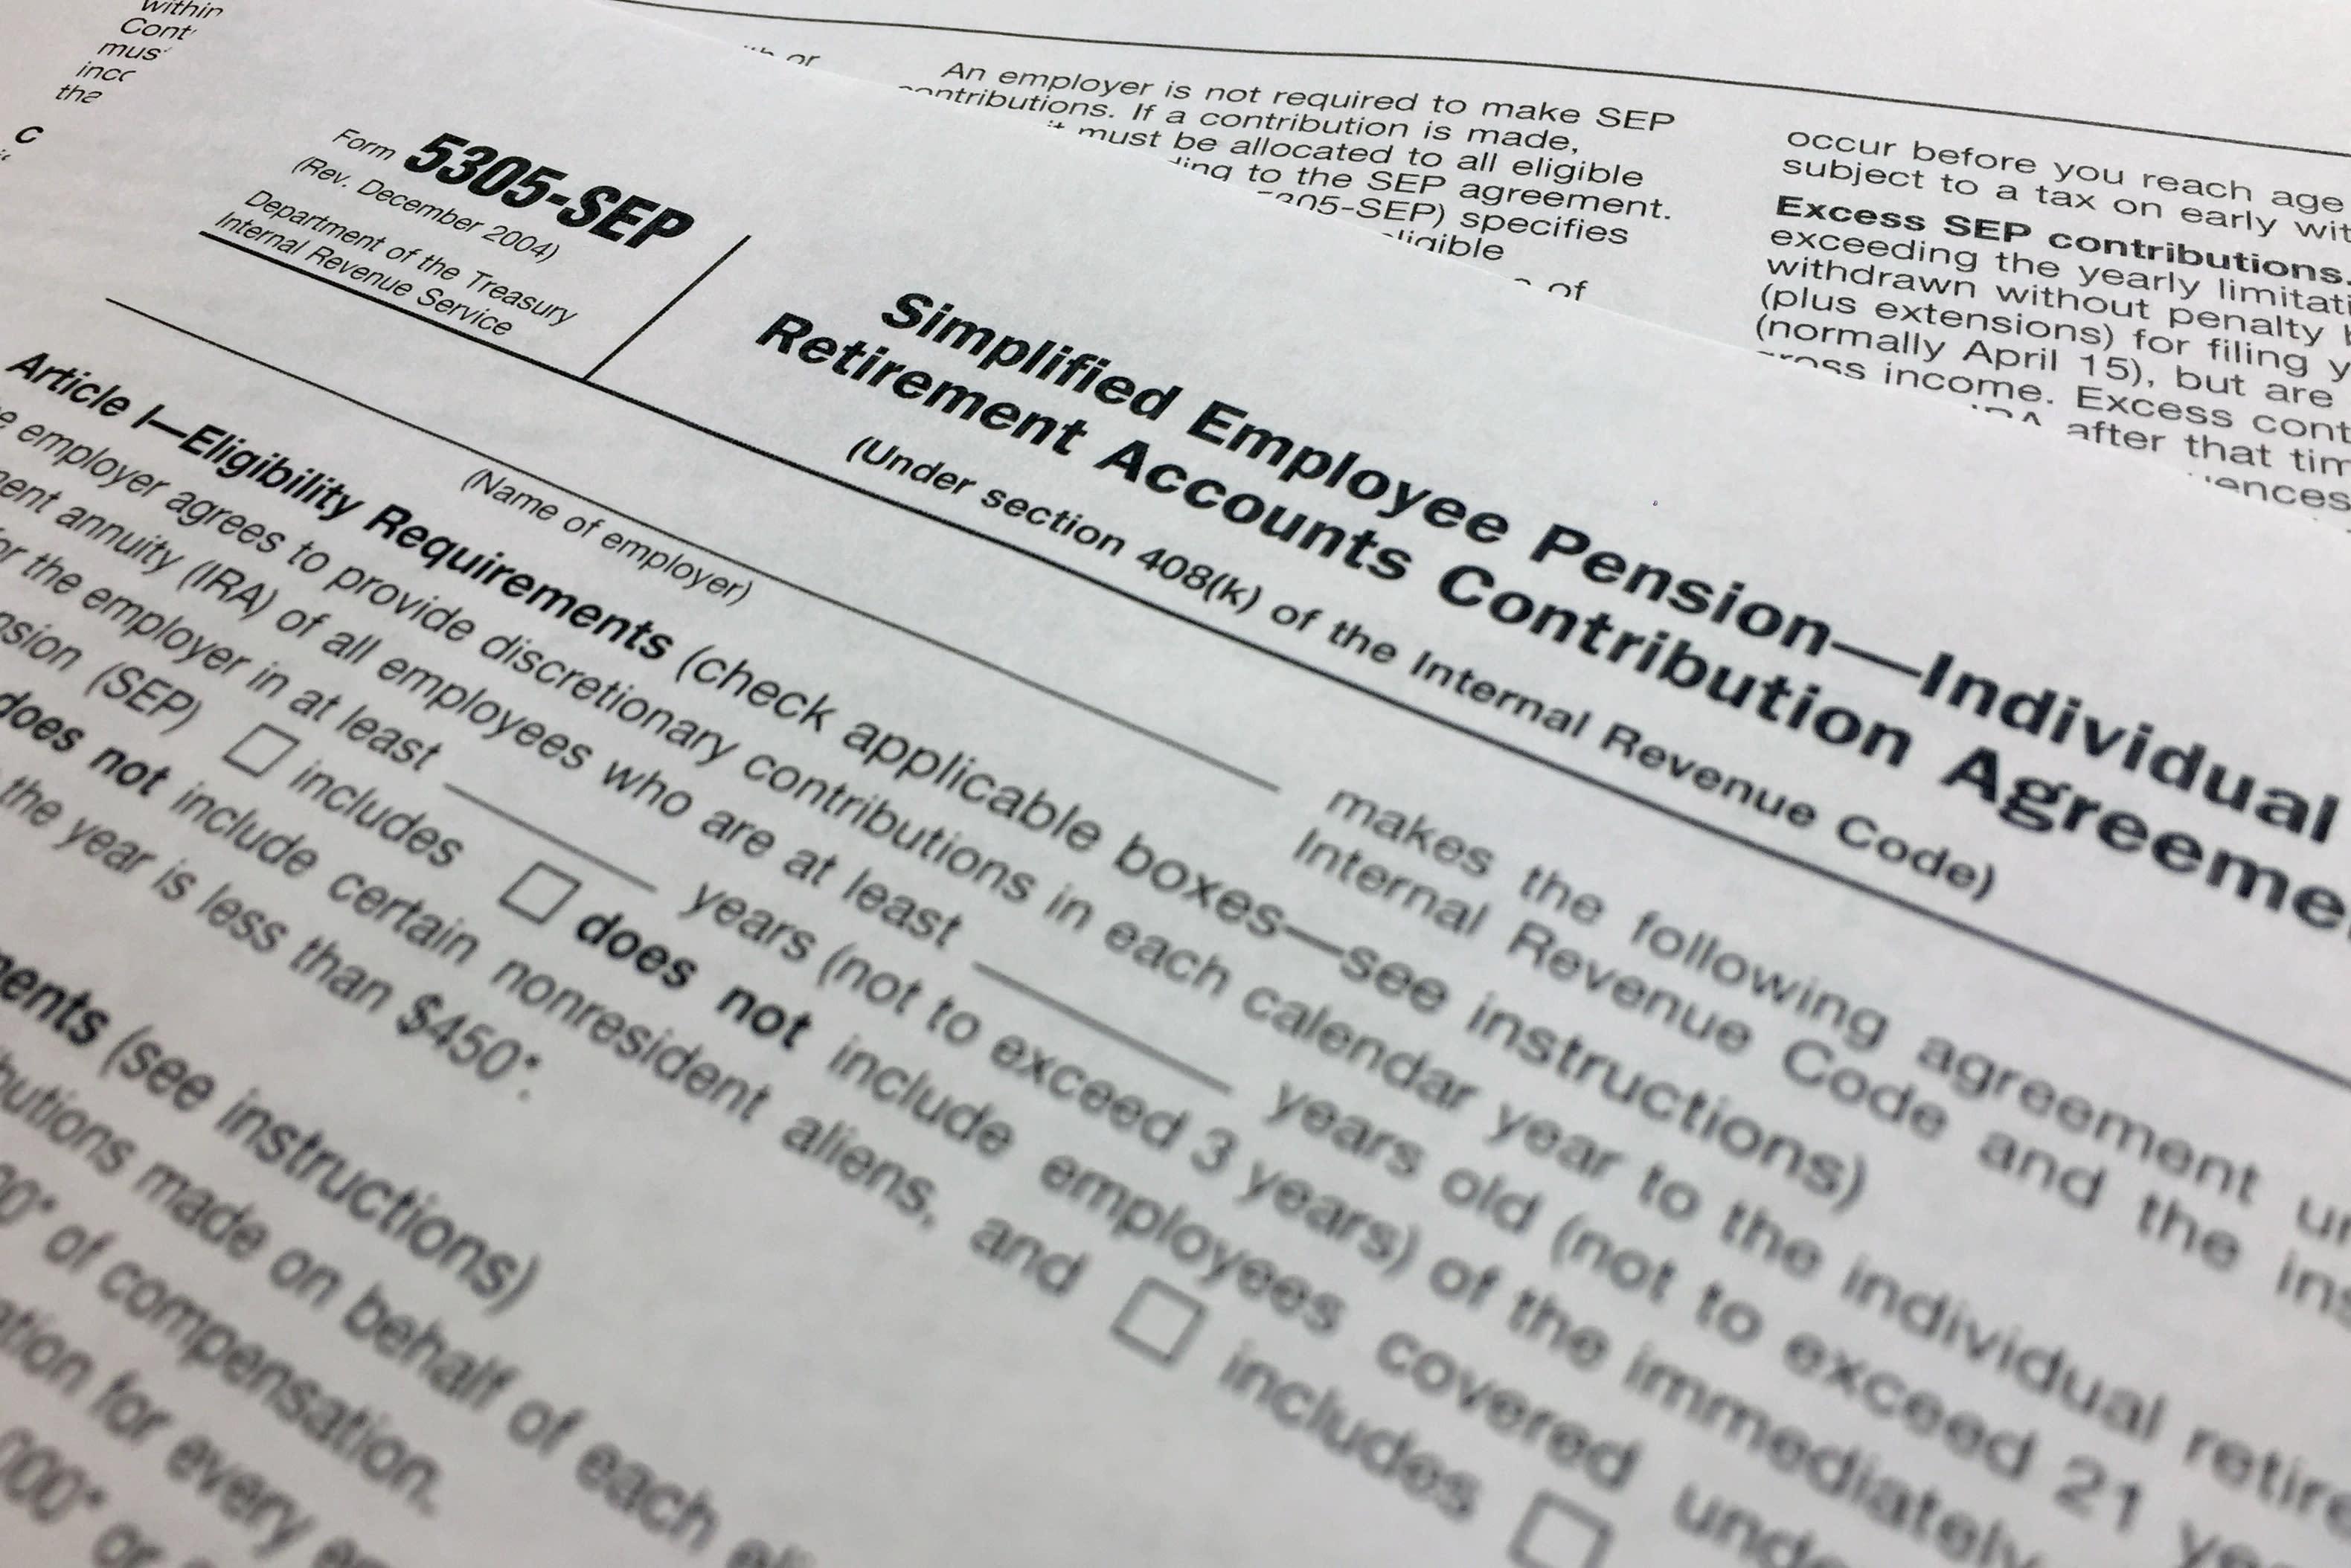 Get started deadline nearing for retirement plan decision falaconquin